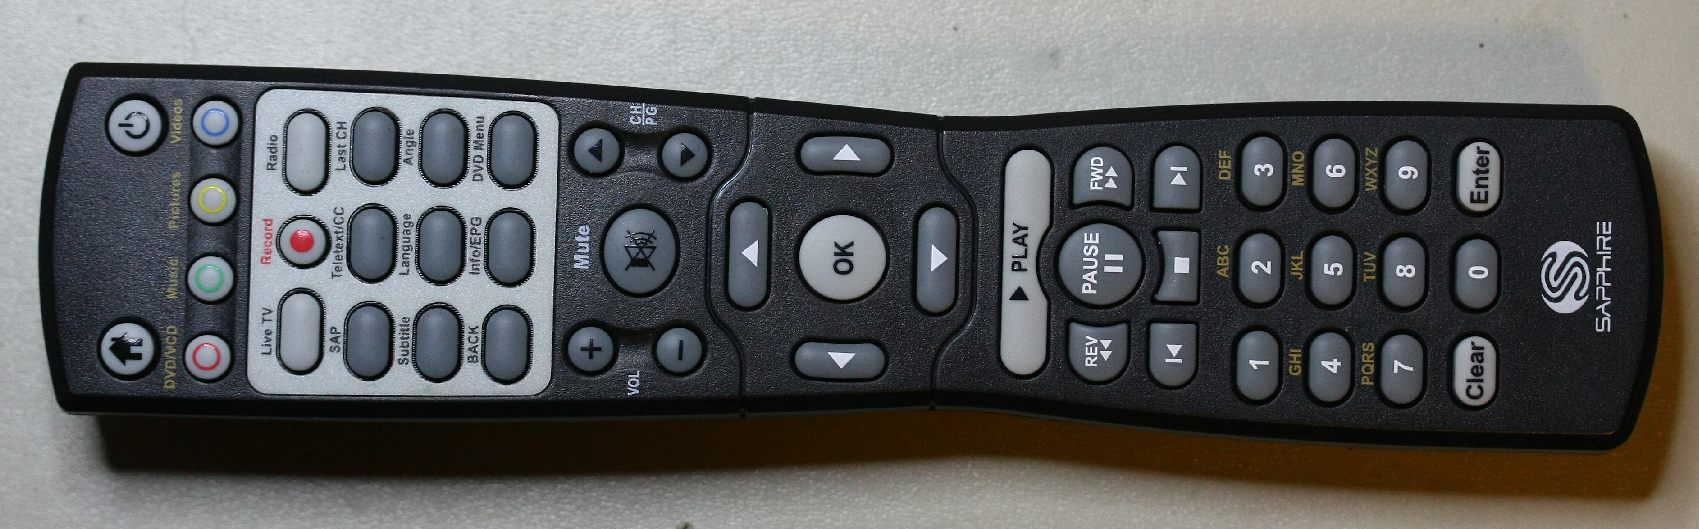 Linux / MythTV driver for Sapphire TheatriX remote control